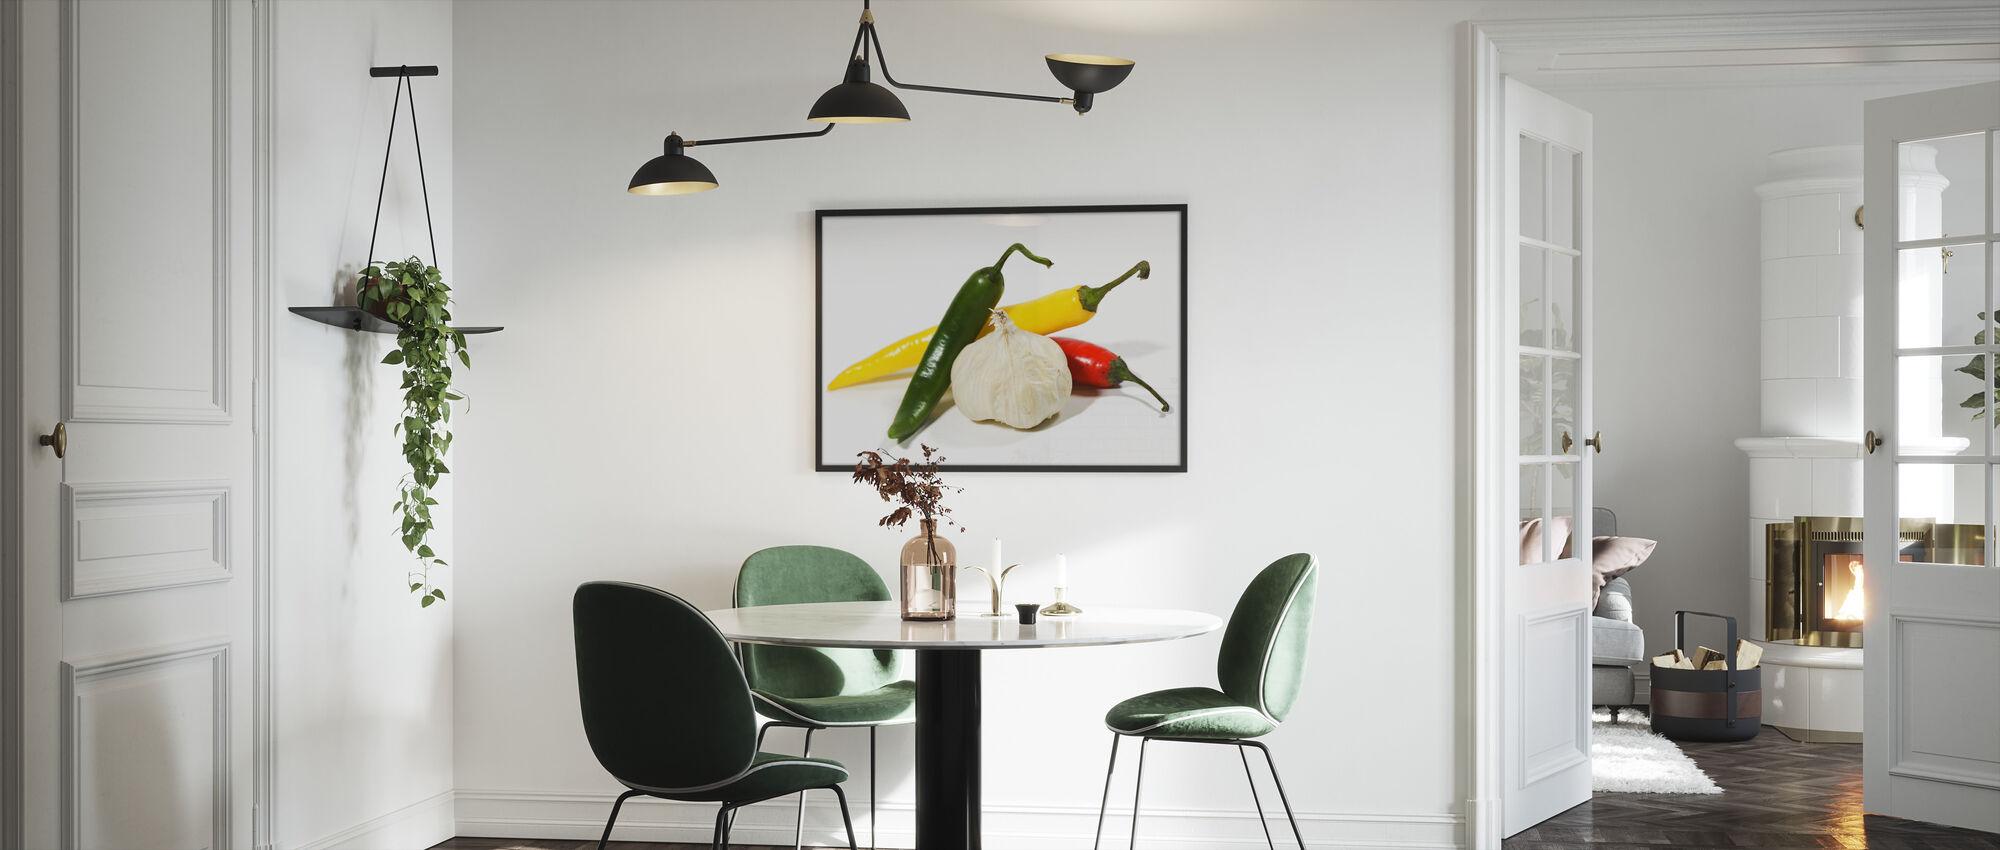 Jalapeño and Garlic - Framed print - Kitchen